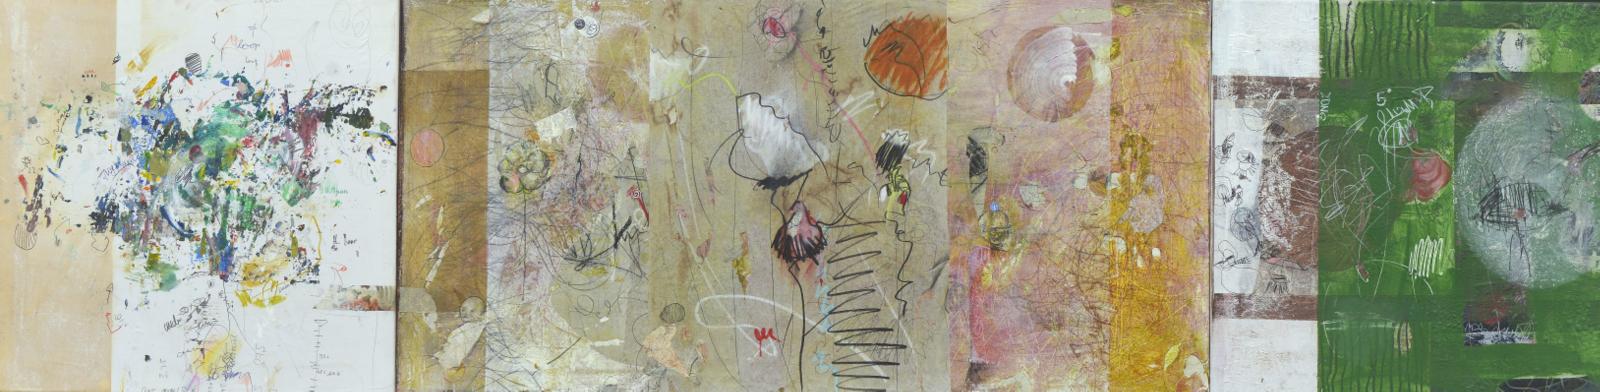 "Rike Stausberg / ""Storyboard"" / Malerei, Collage / 50 x 200 cm / 2015"